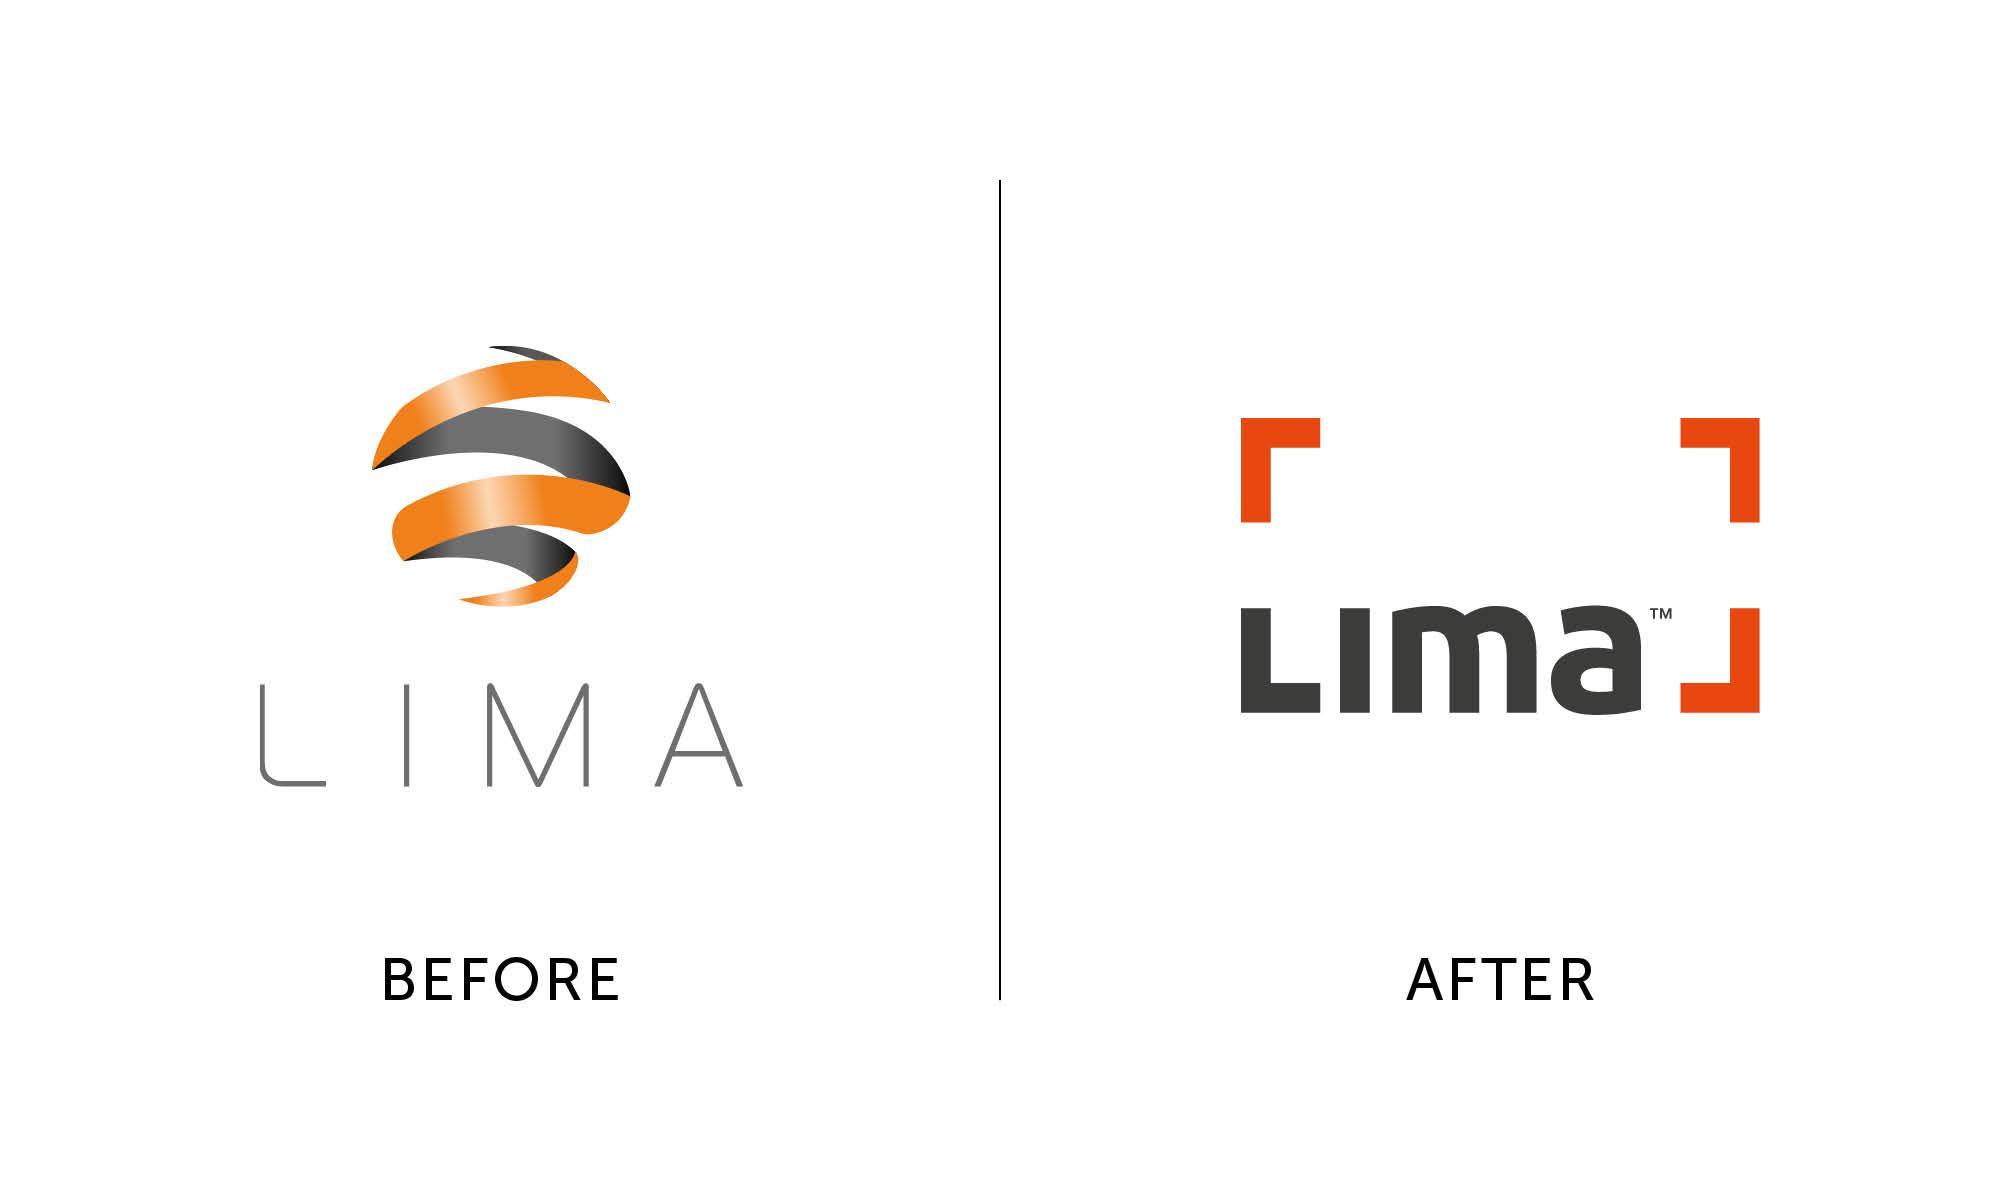 LIMA_Case_Study_2.jpg